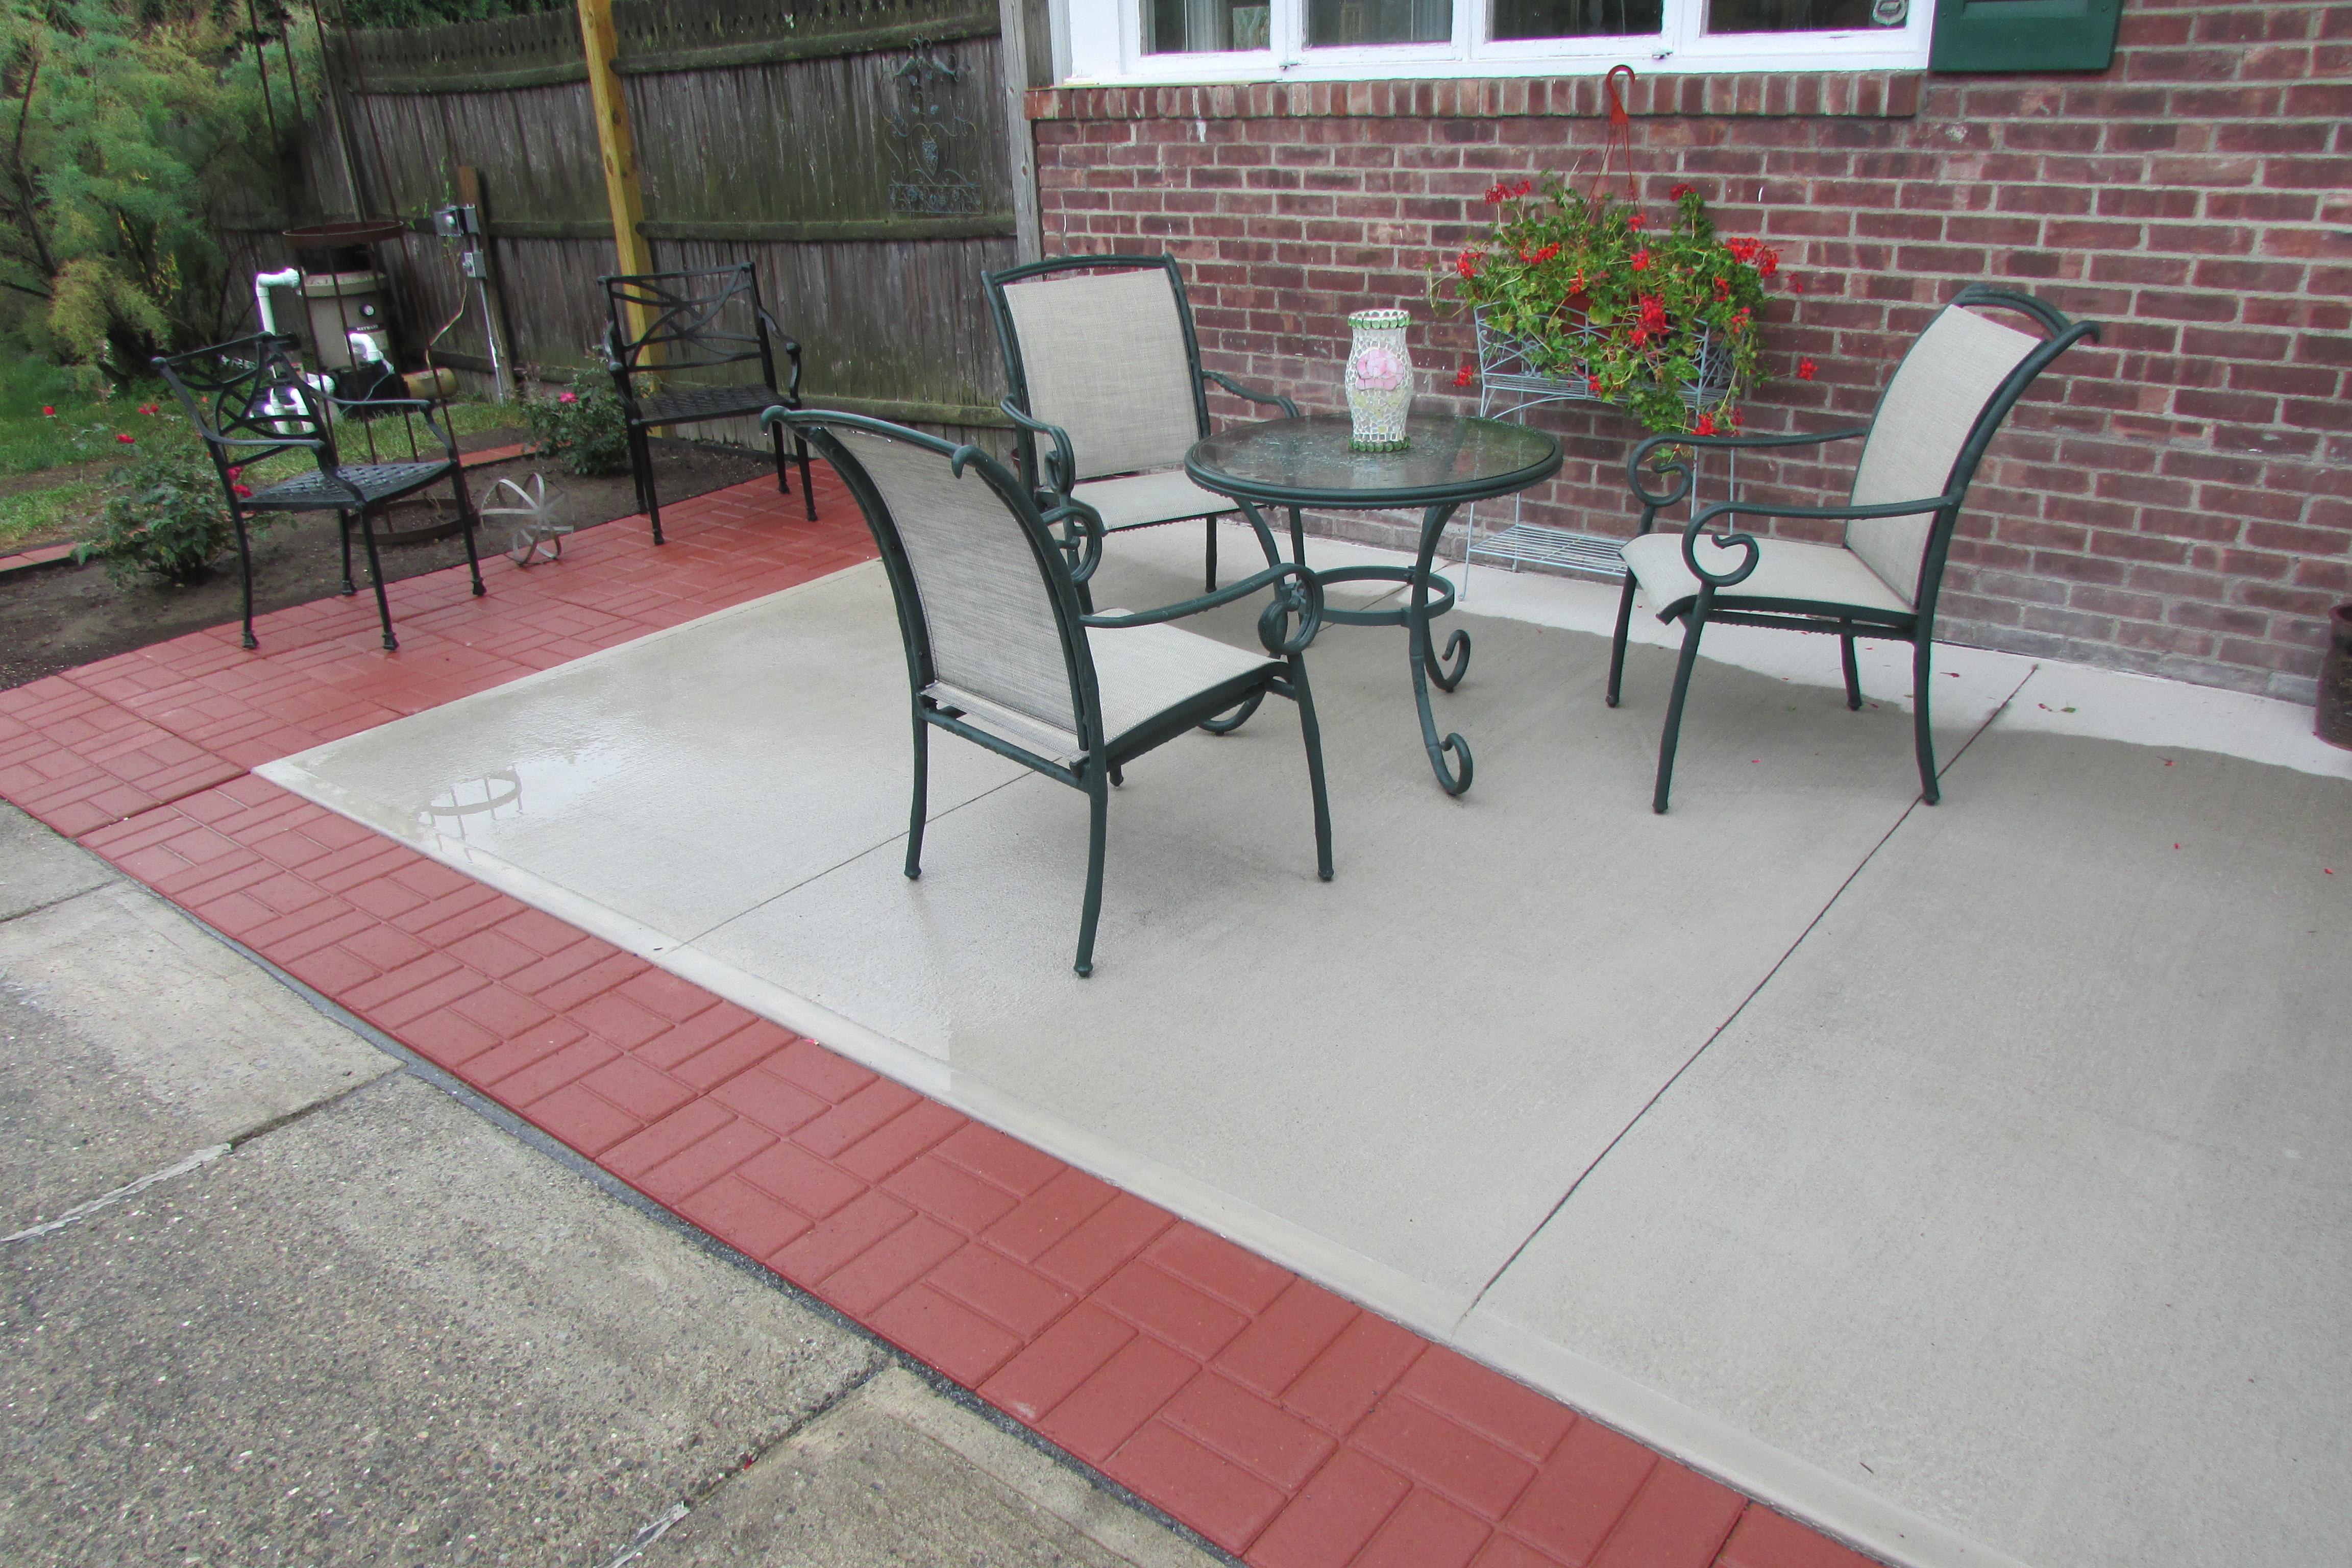 Fred Gonsowski Garden Home | Garden Design, Gardening and ... on Square Concrete Patio Ideas id=86253